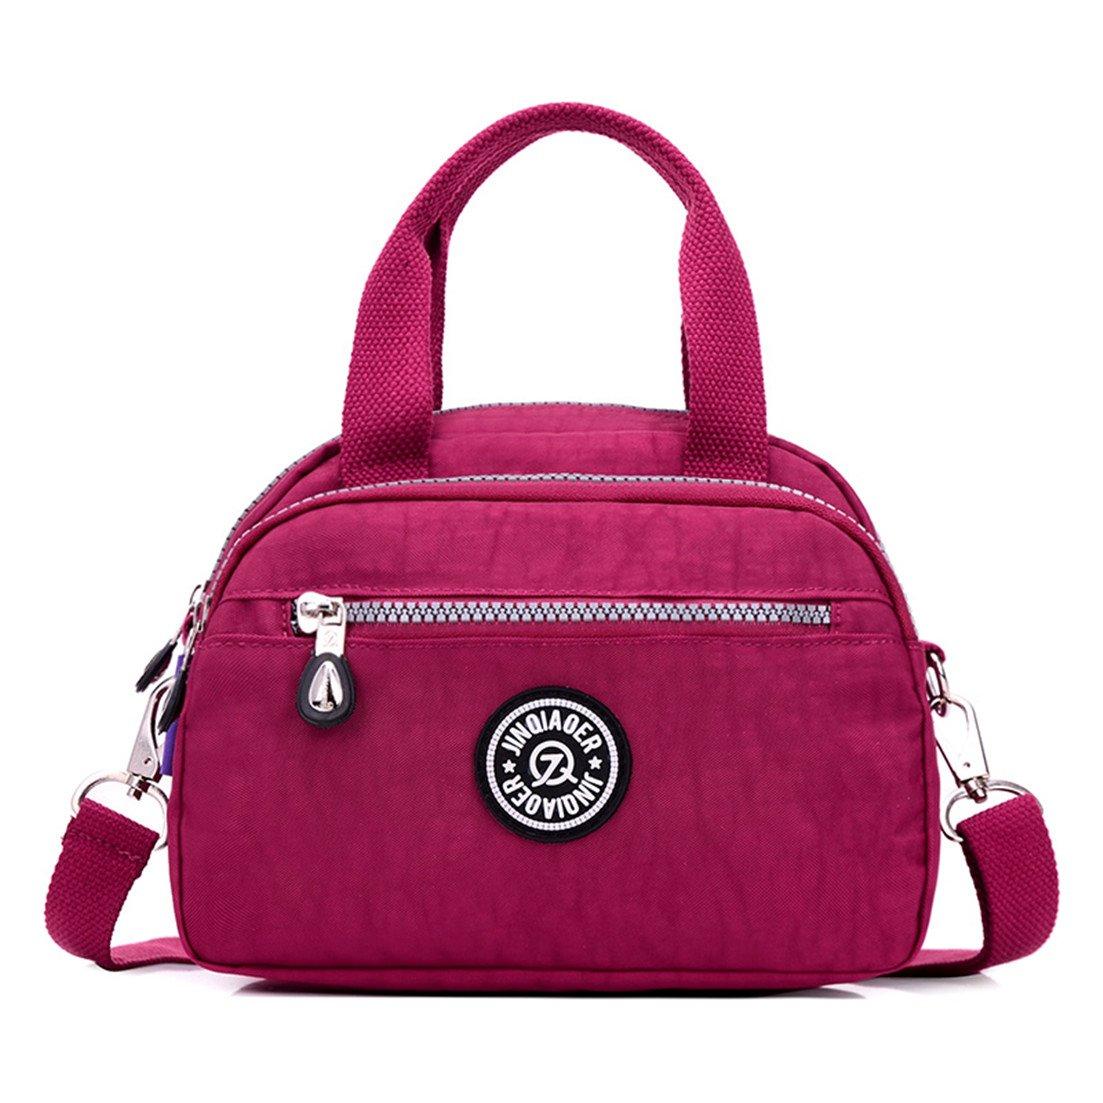 TianHengYi Girls Casual Small Nylon Cross-body Shoulder Bag Multi Pockets Lightweight Handbags & Purses 3120 Claret